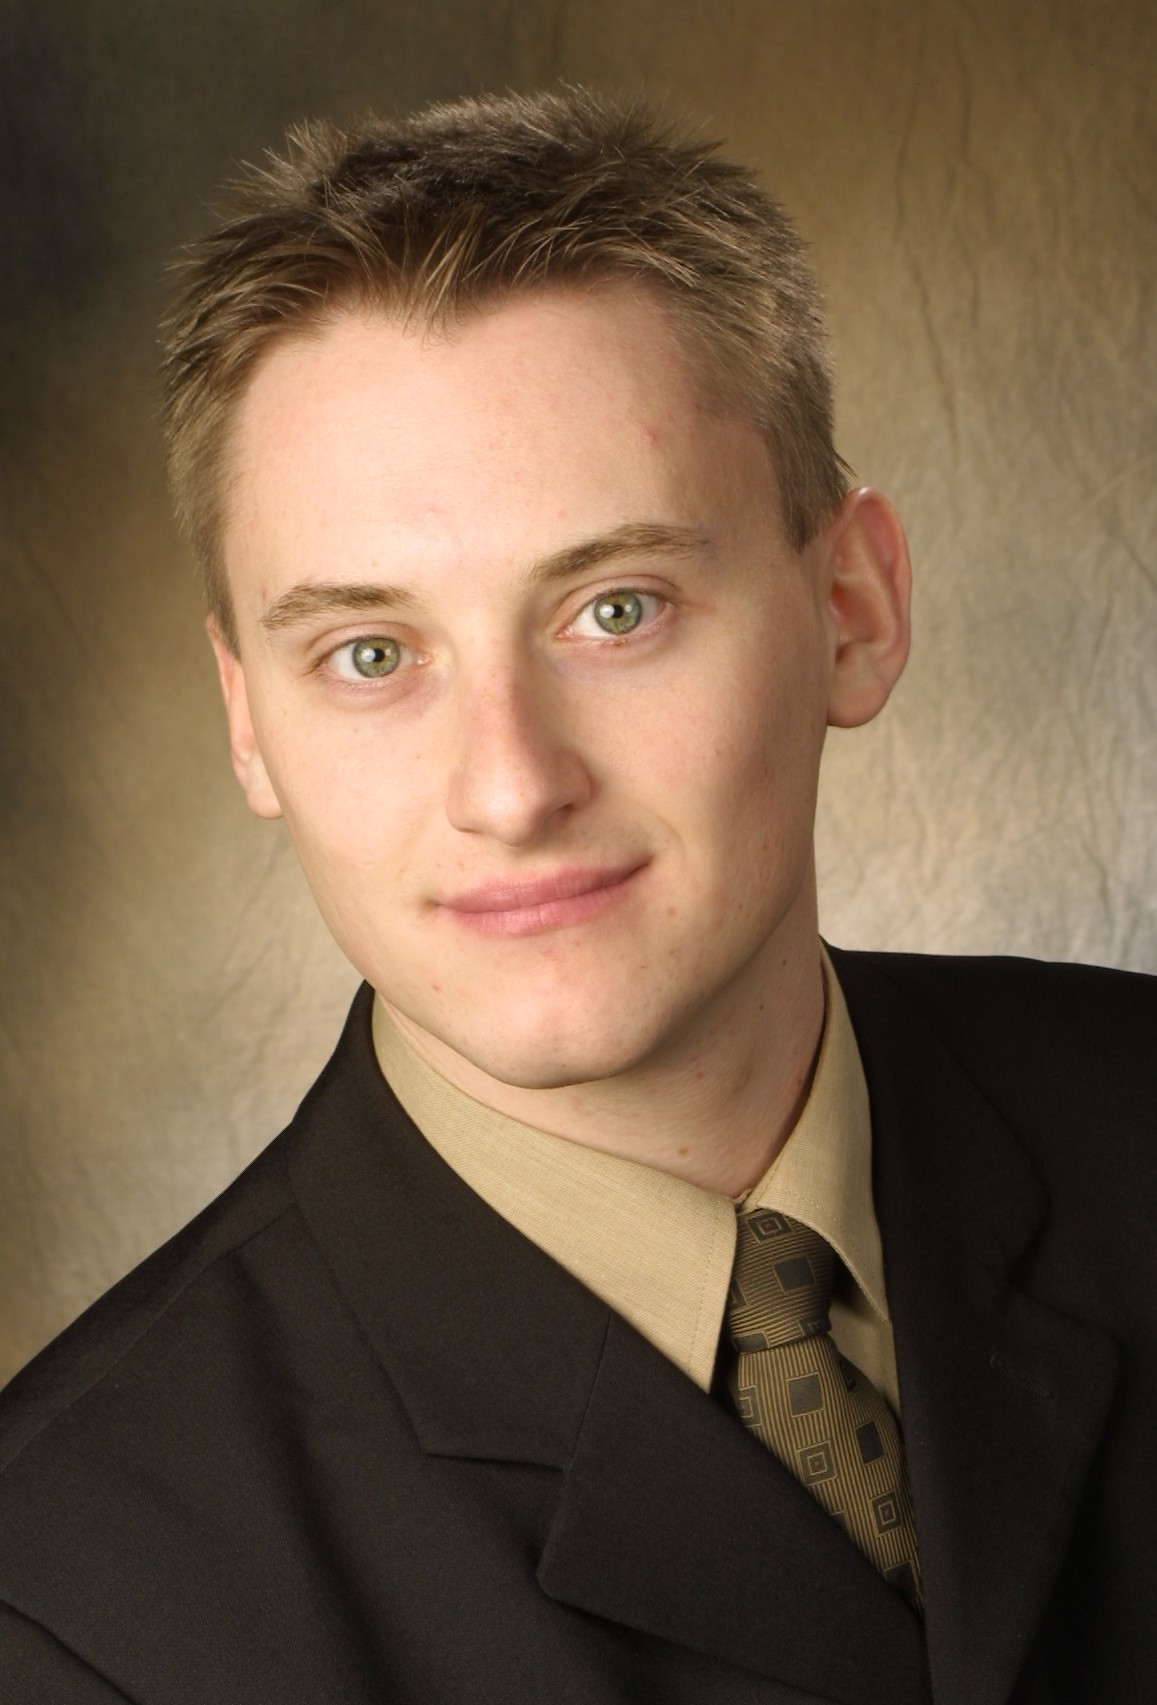 Michael Braun Net Worth